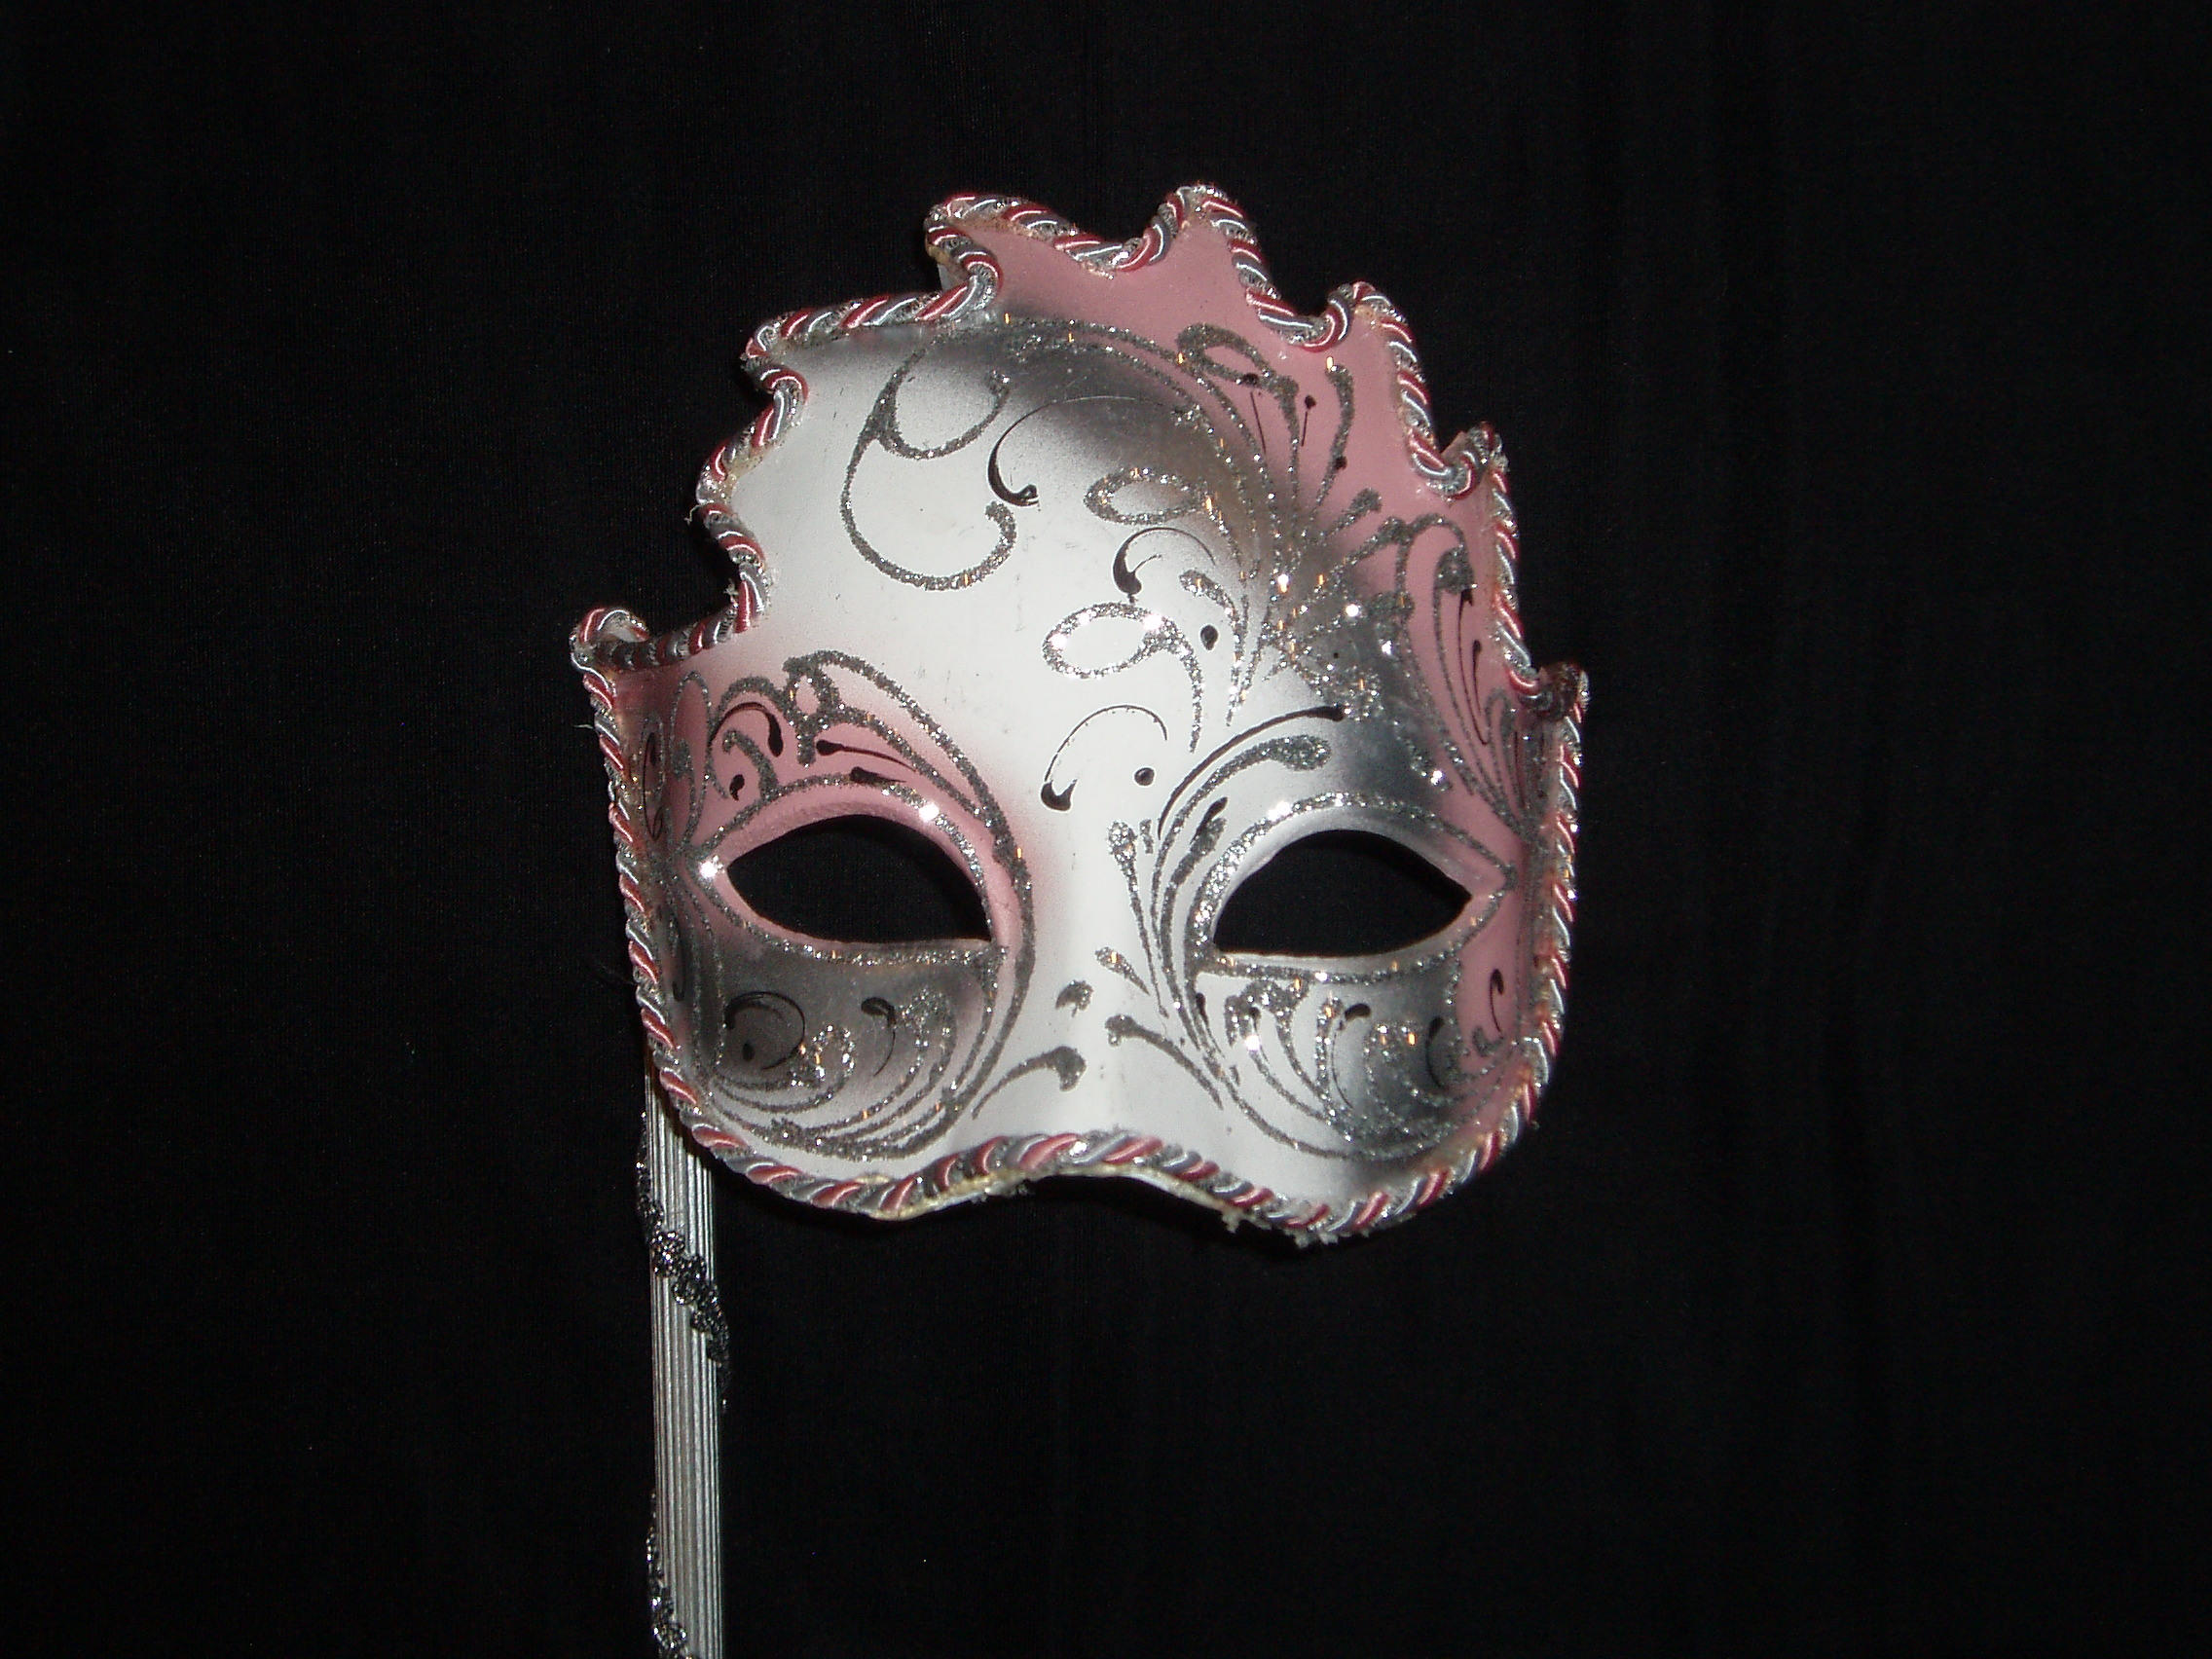 pink mask 2 by GreenEyezz-stock